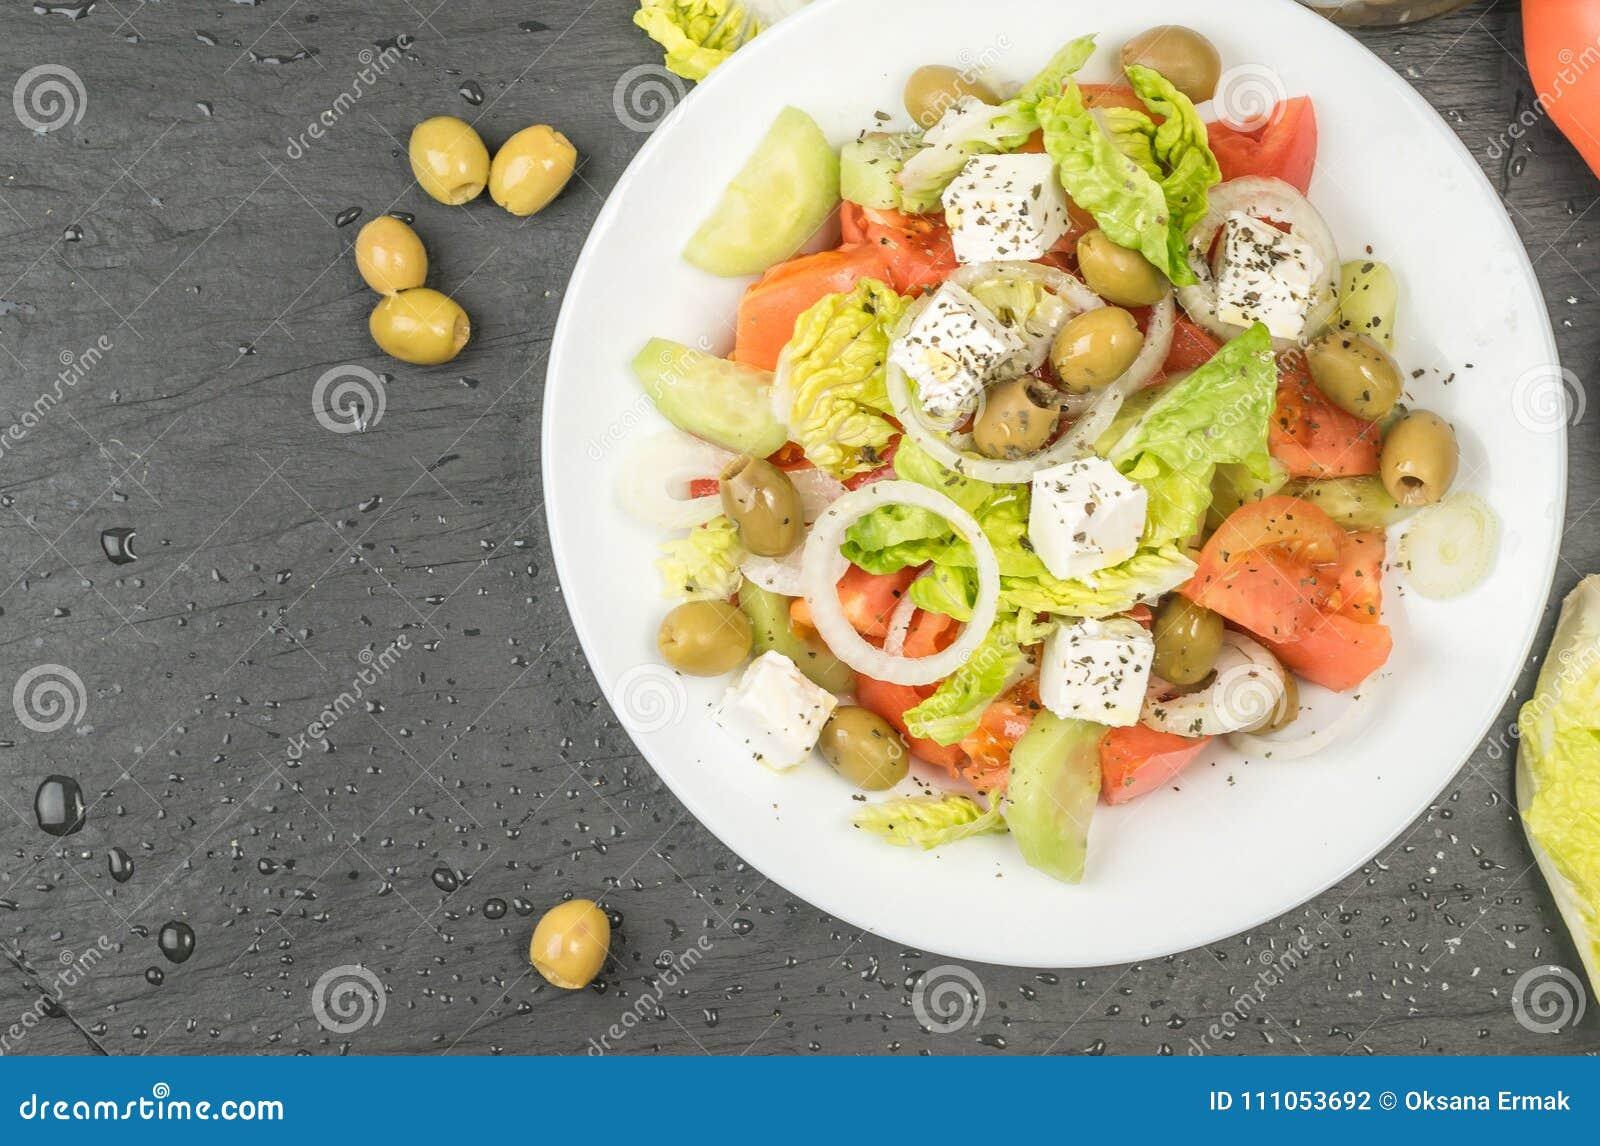 Greek Salad Or Garden Salad Stock Photo Image Of Green